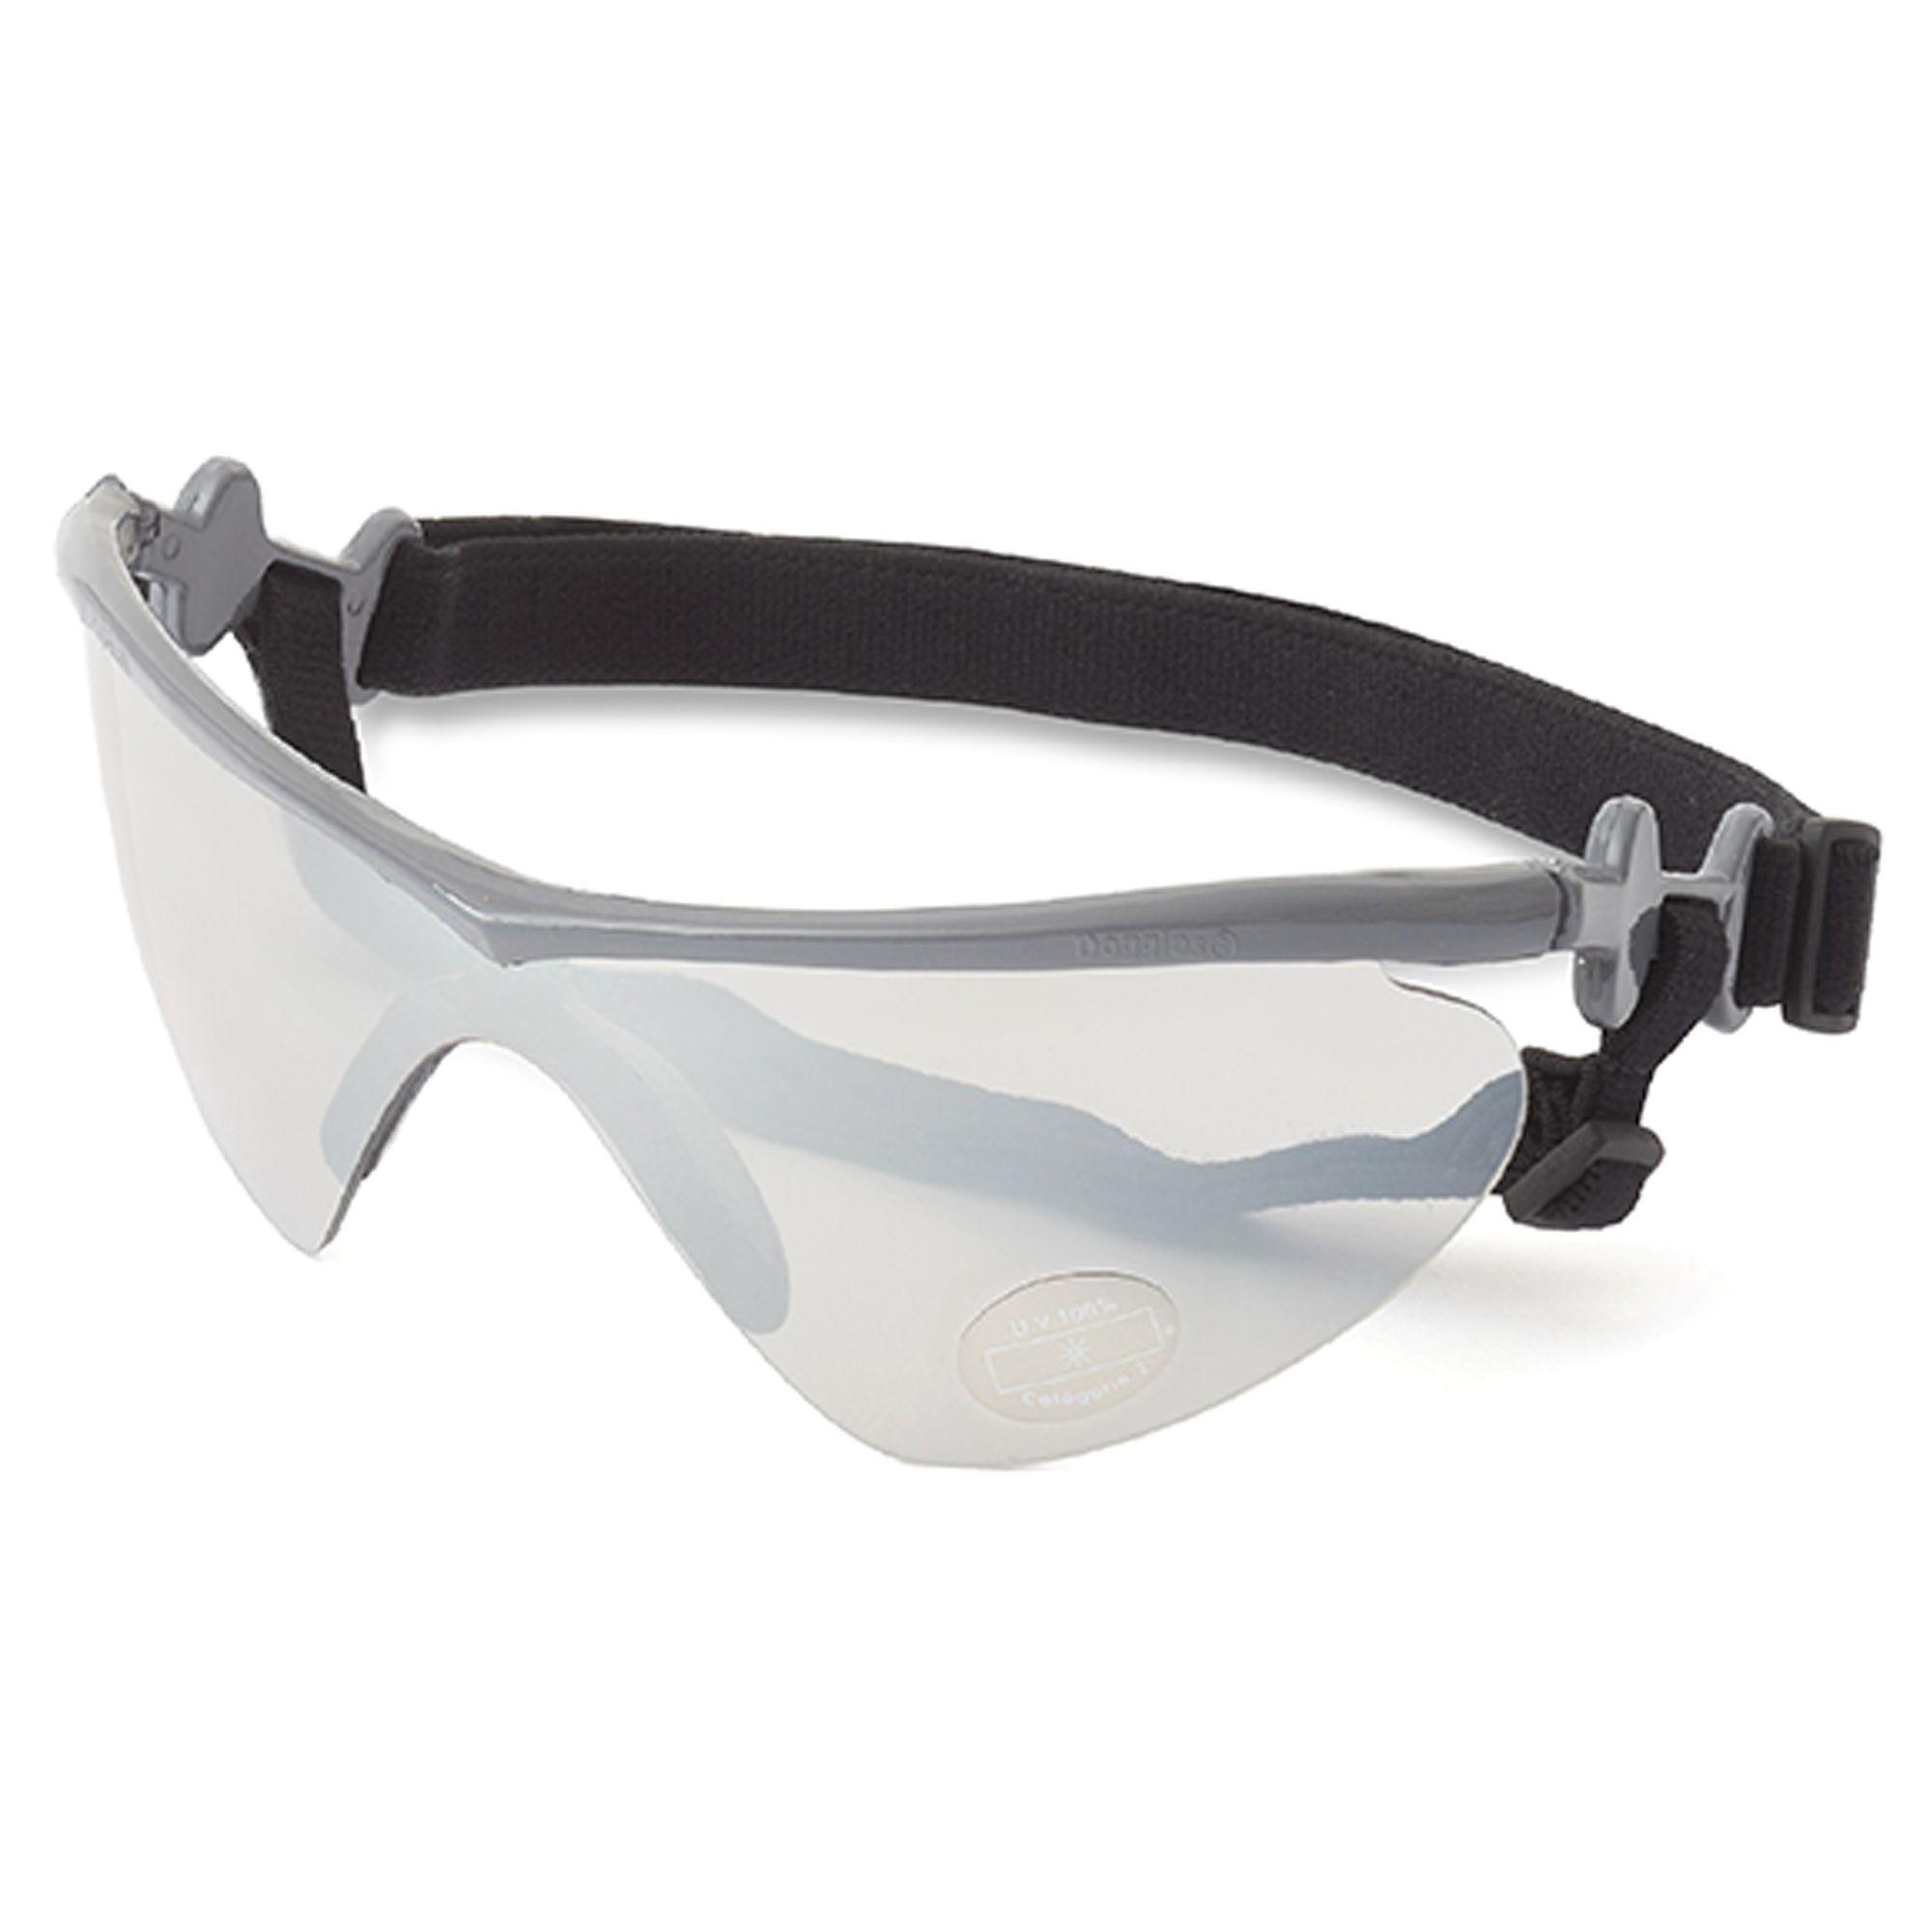 Doggles Rubber Framed Dog Sunglasses size: Medium, Grey